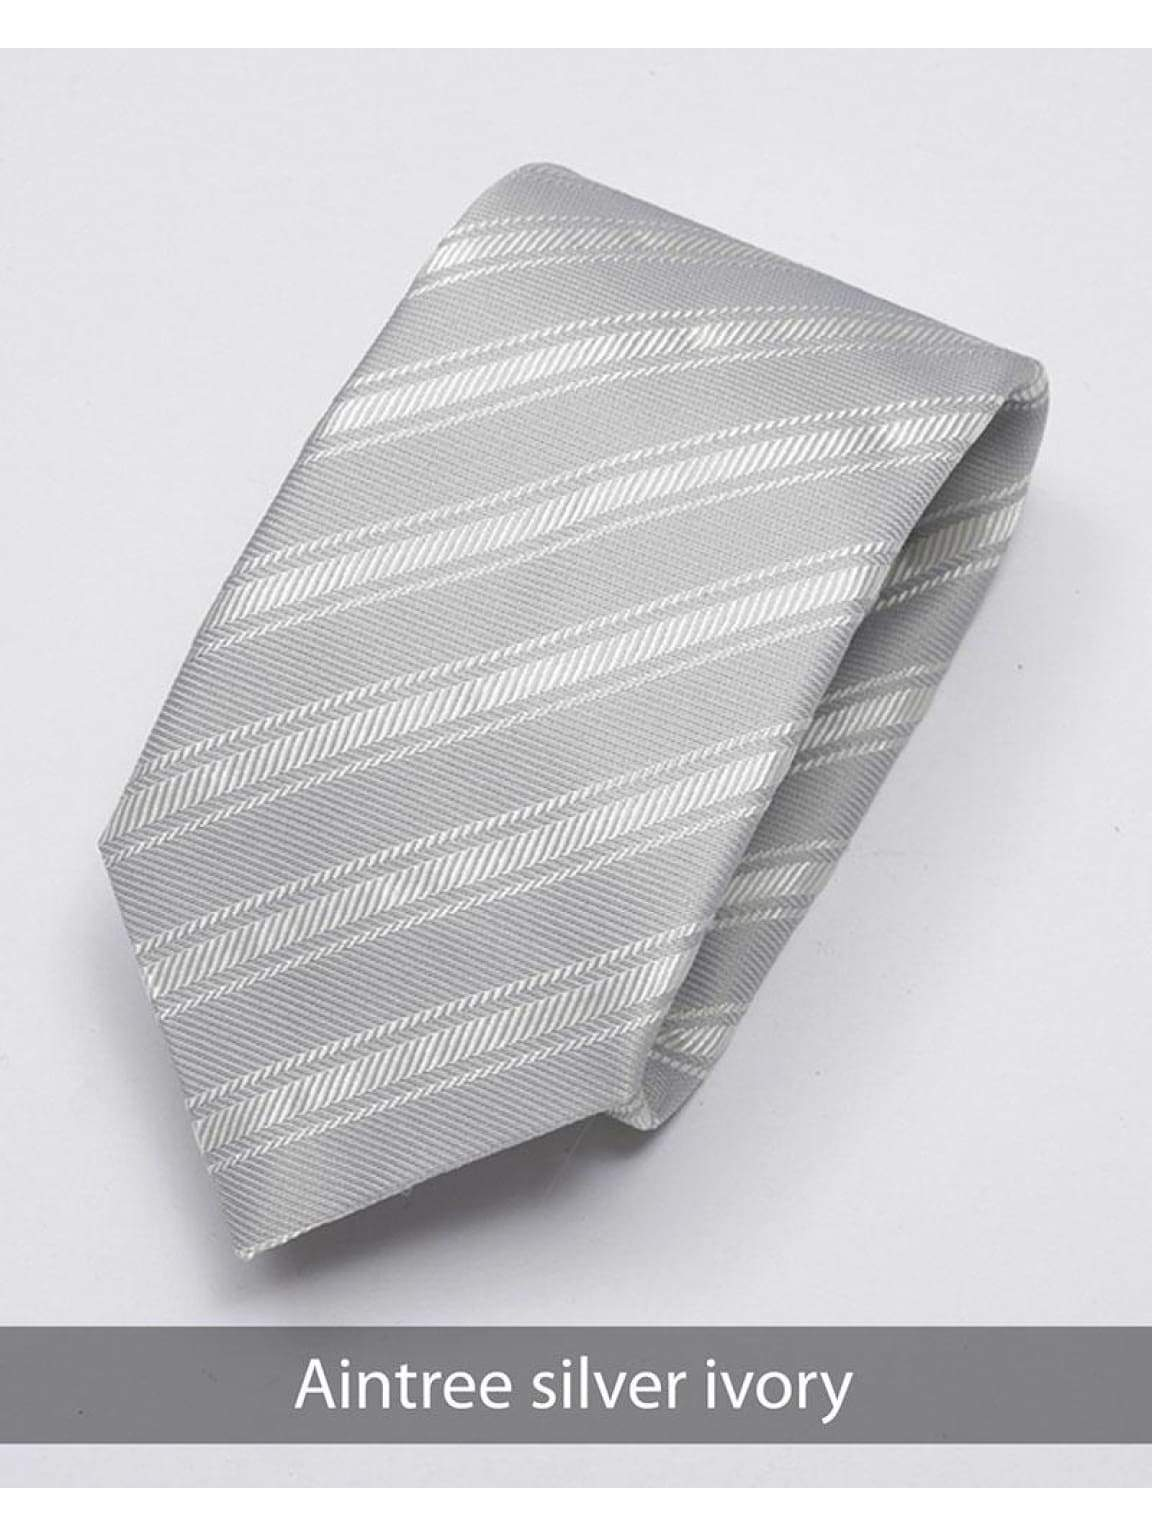 Heirloom Aintree Mens Silver Ivory Stripped Tie - Accessories